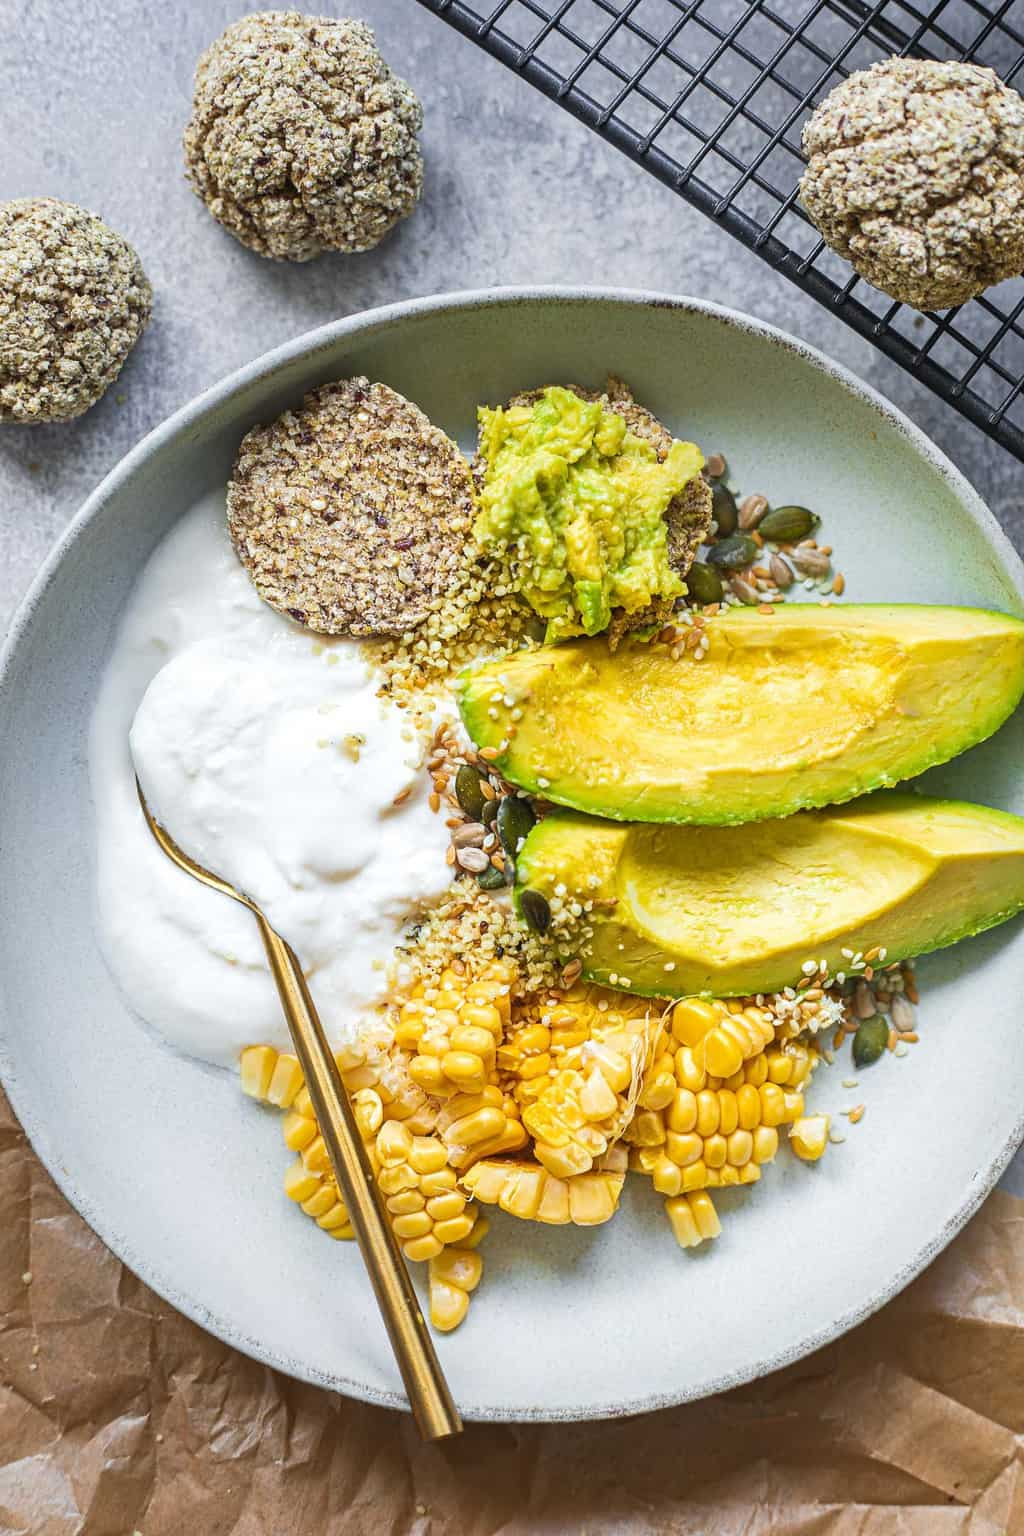 Vegan breakfast bowl with bread rolls, soy yoghurt and avocado